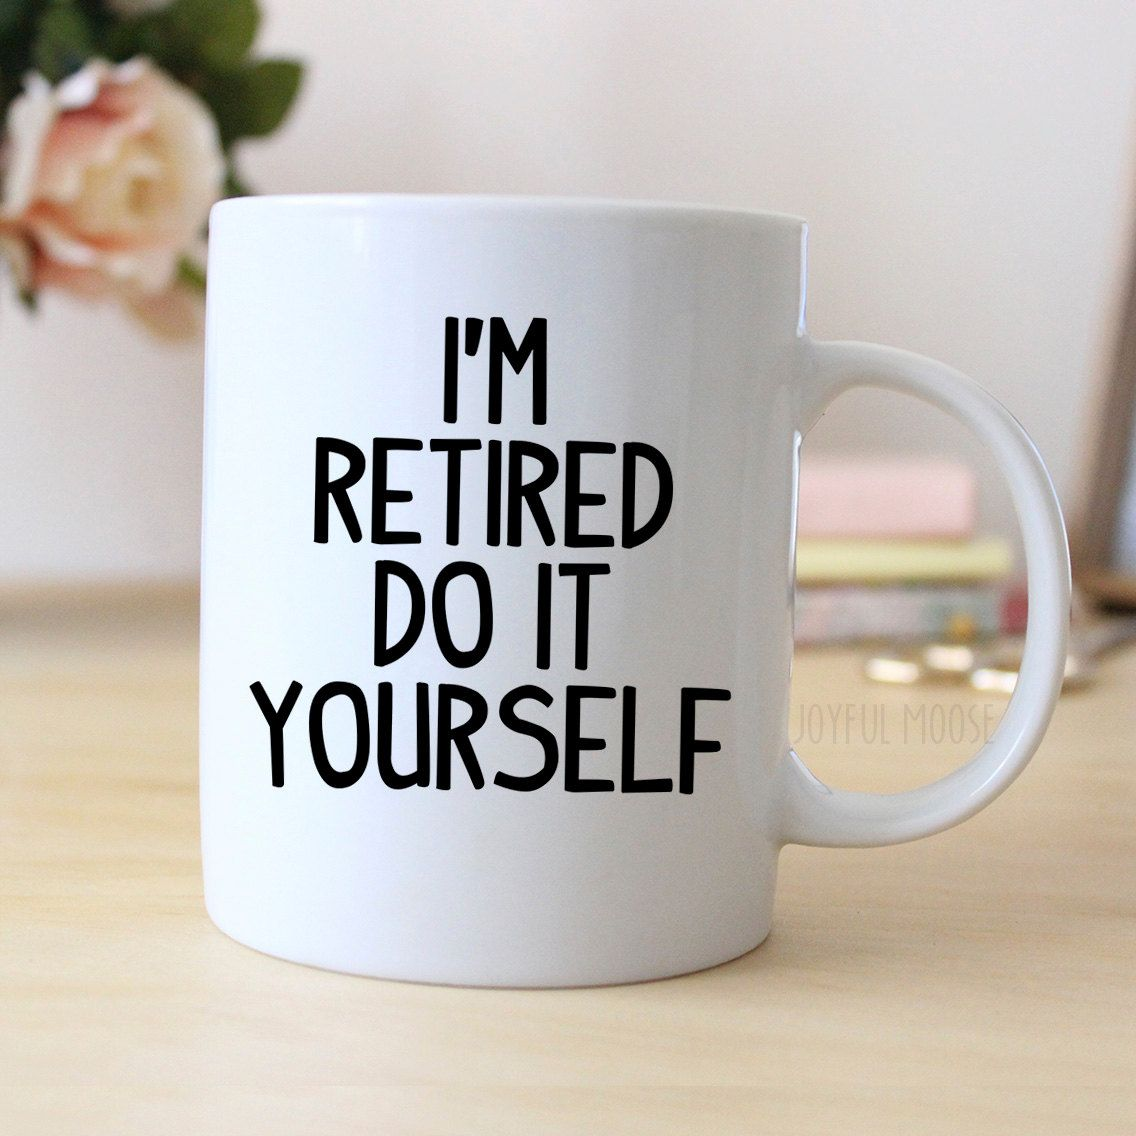 best retirement gift ideas for women - good retirement gifts for